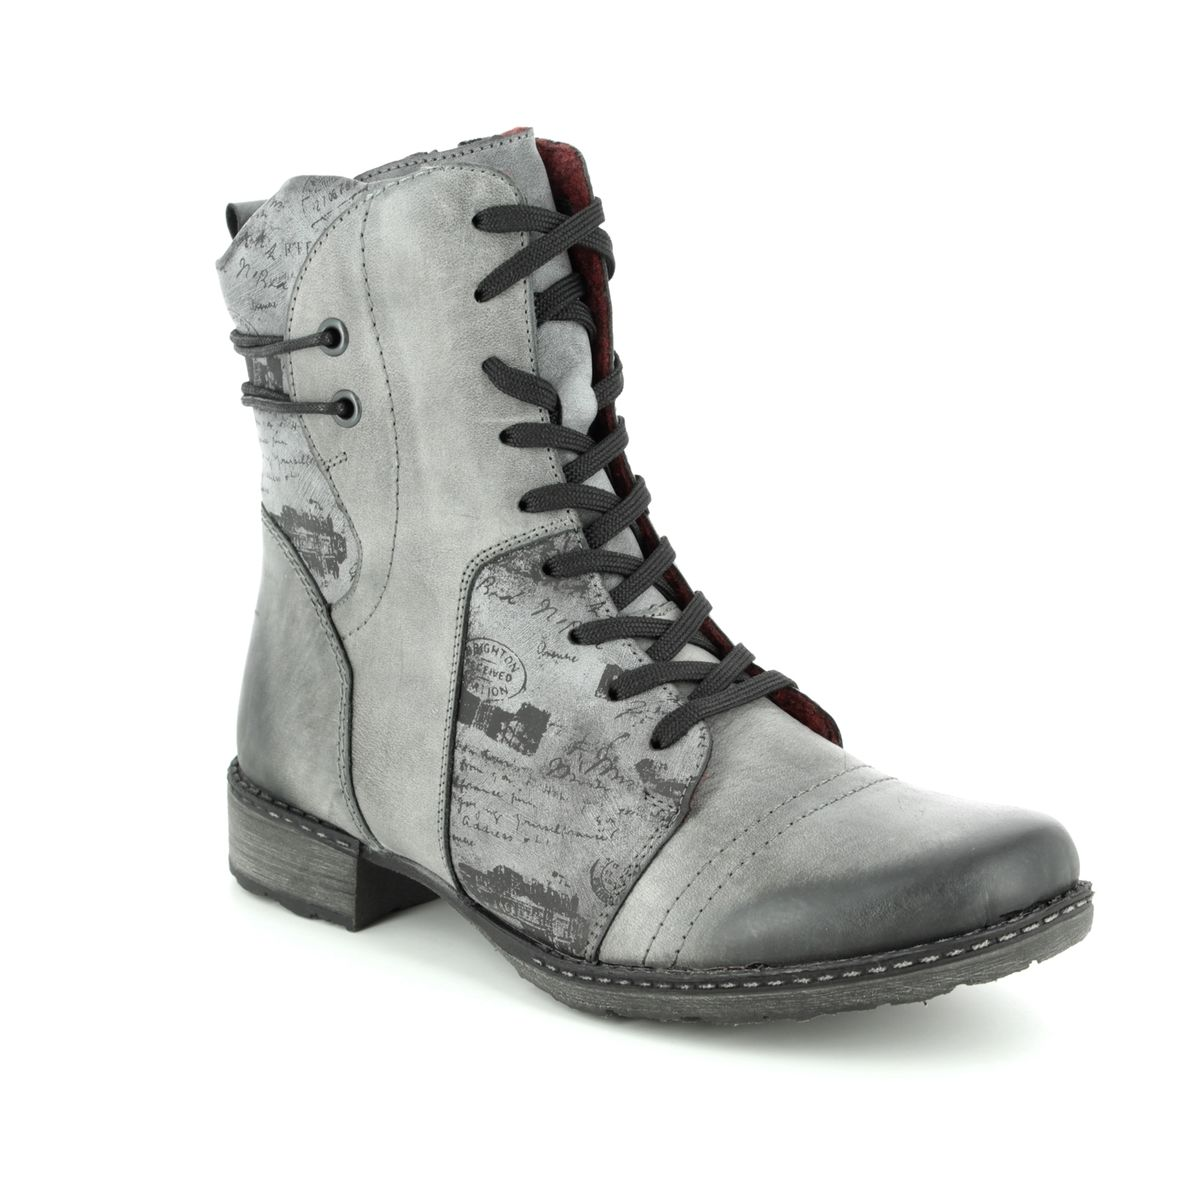 Remonte Ankle Boots - Grey matt leather - D4366-02 PEEMONT 1aeb7ec60